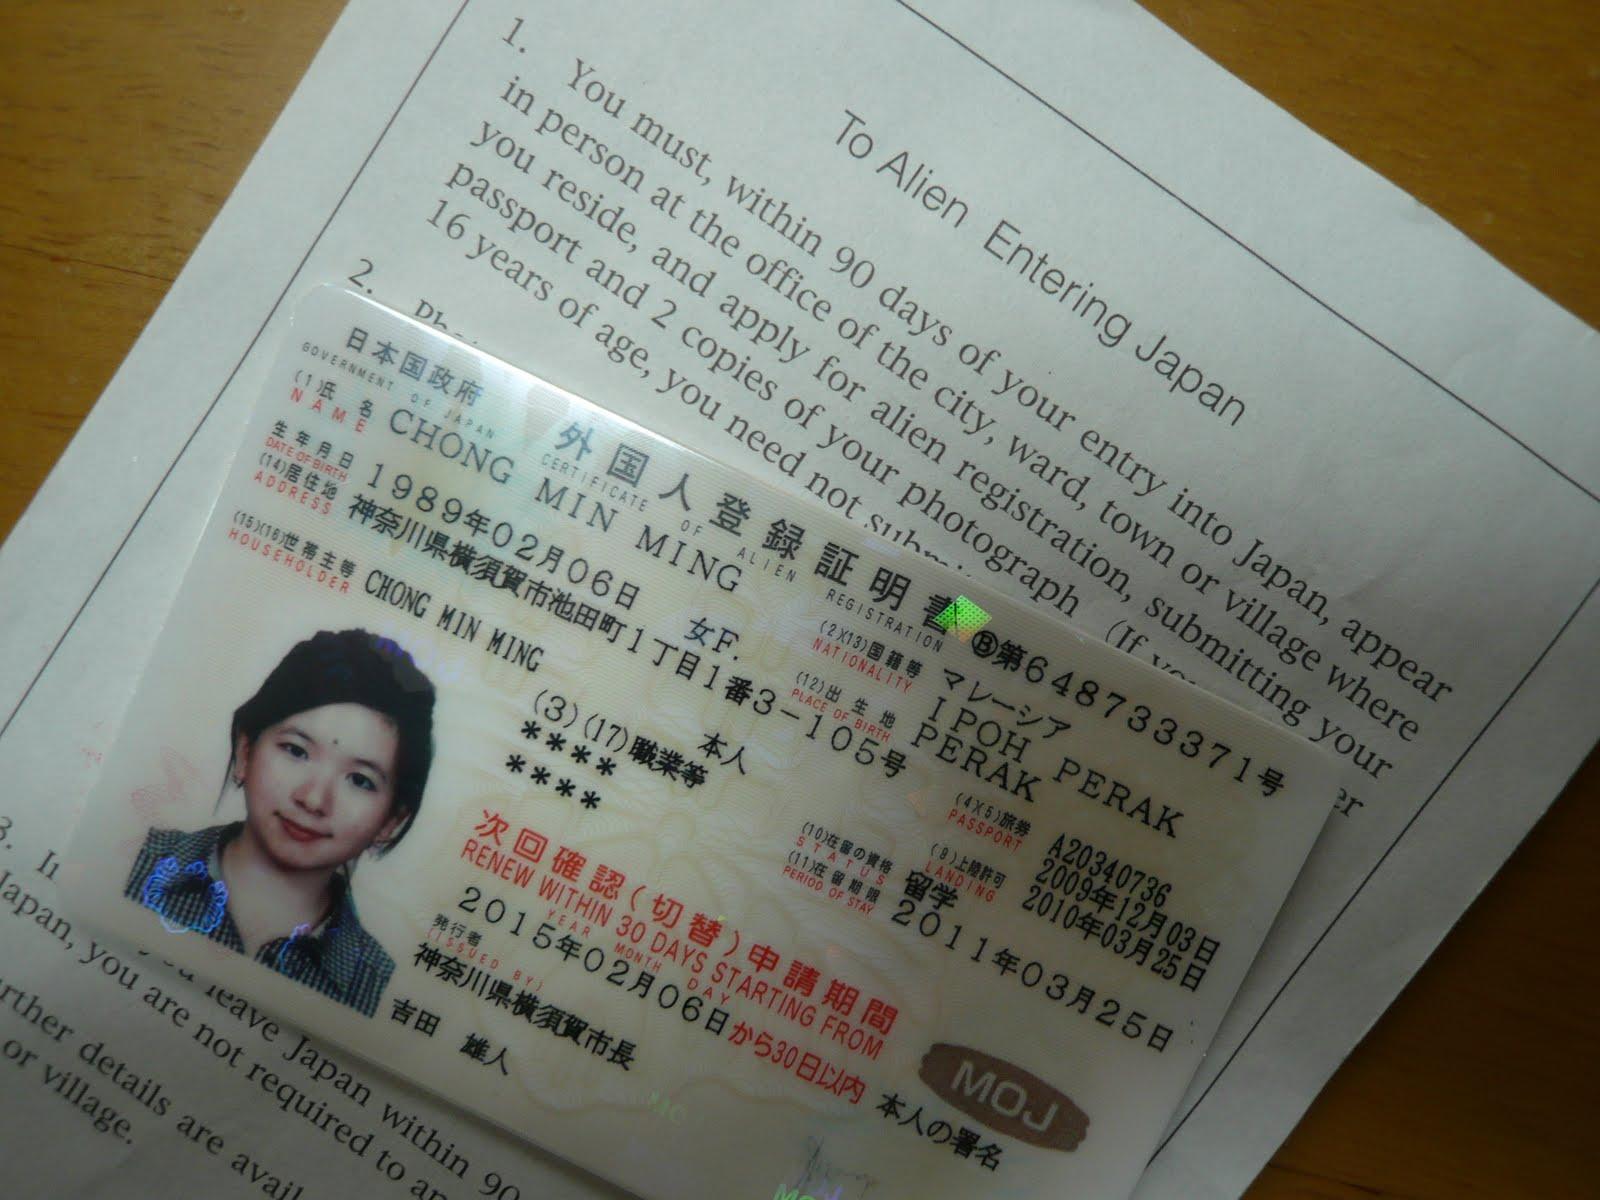 alien registration card certificate shermayne naive tokyo